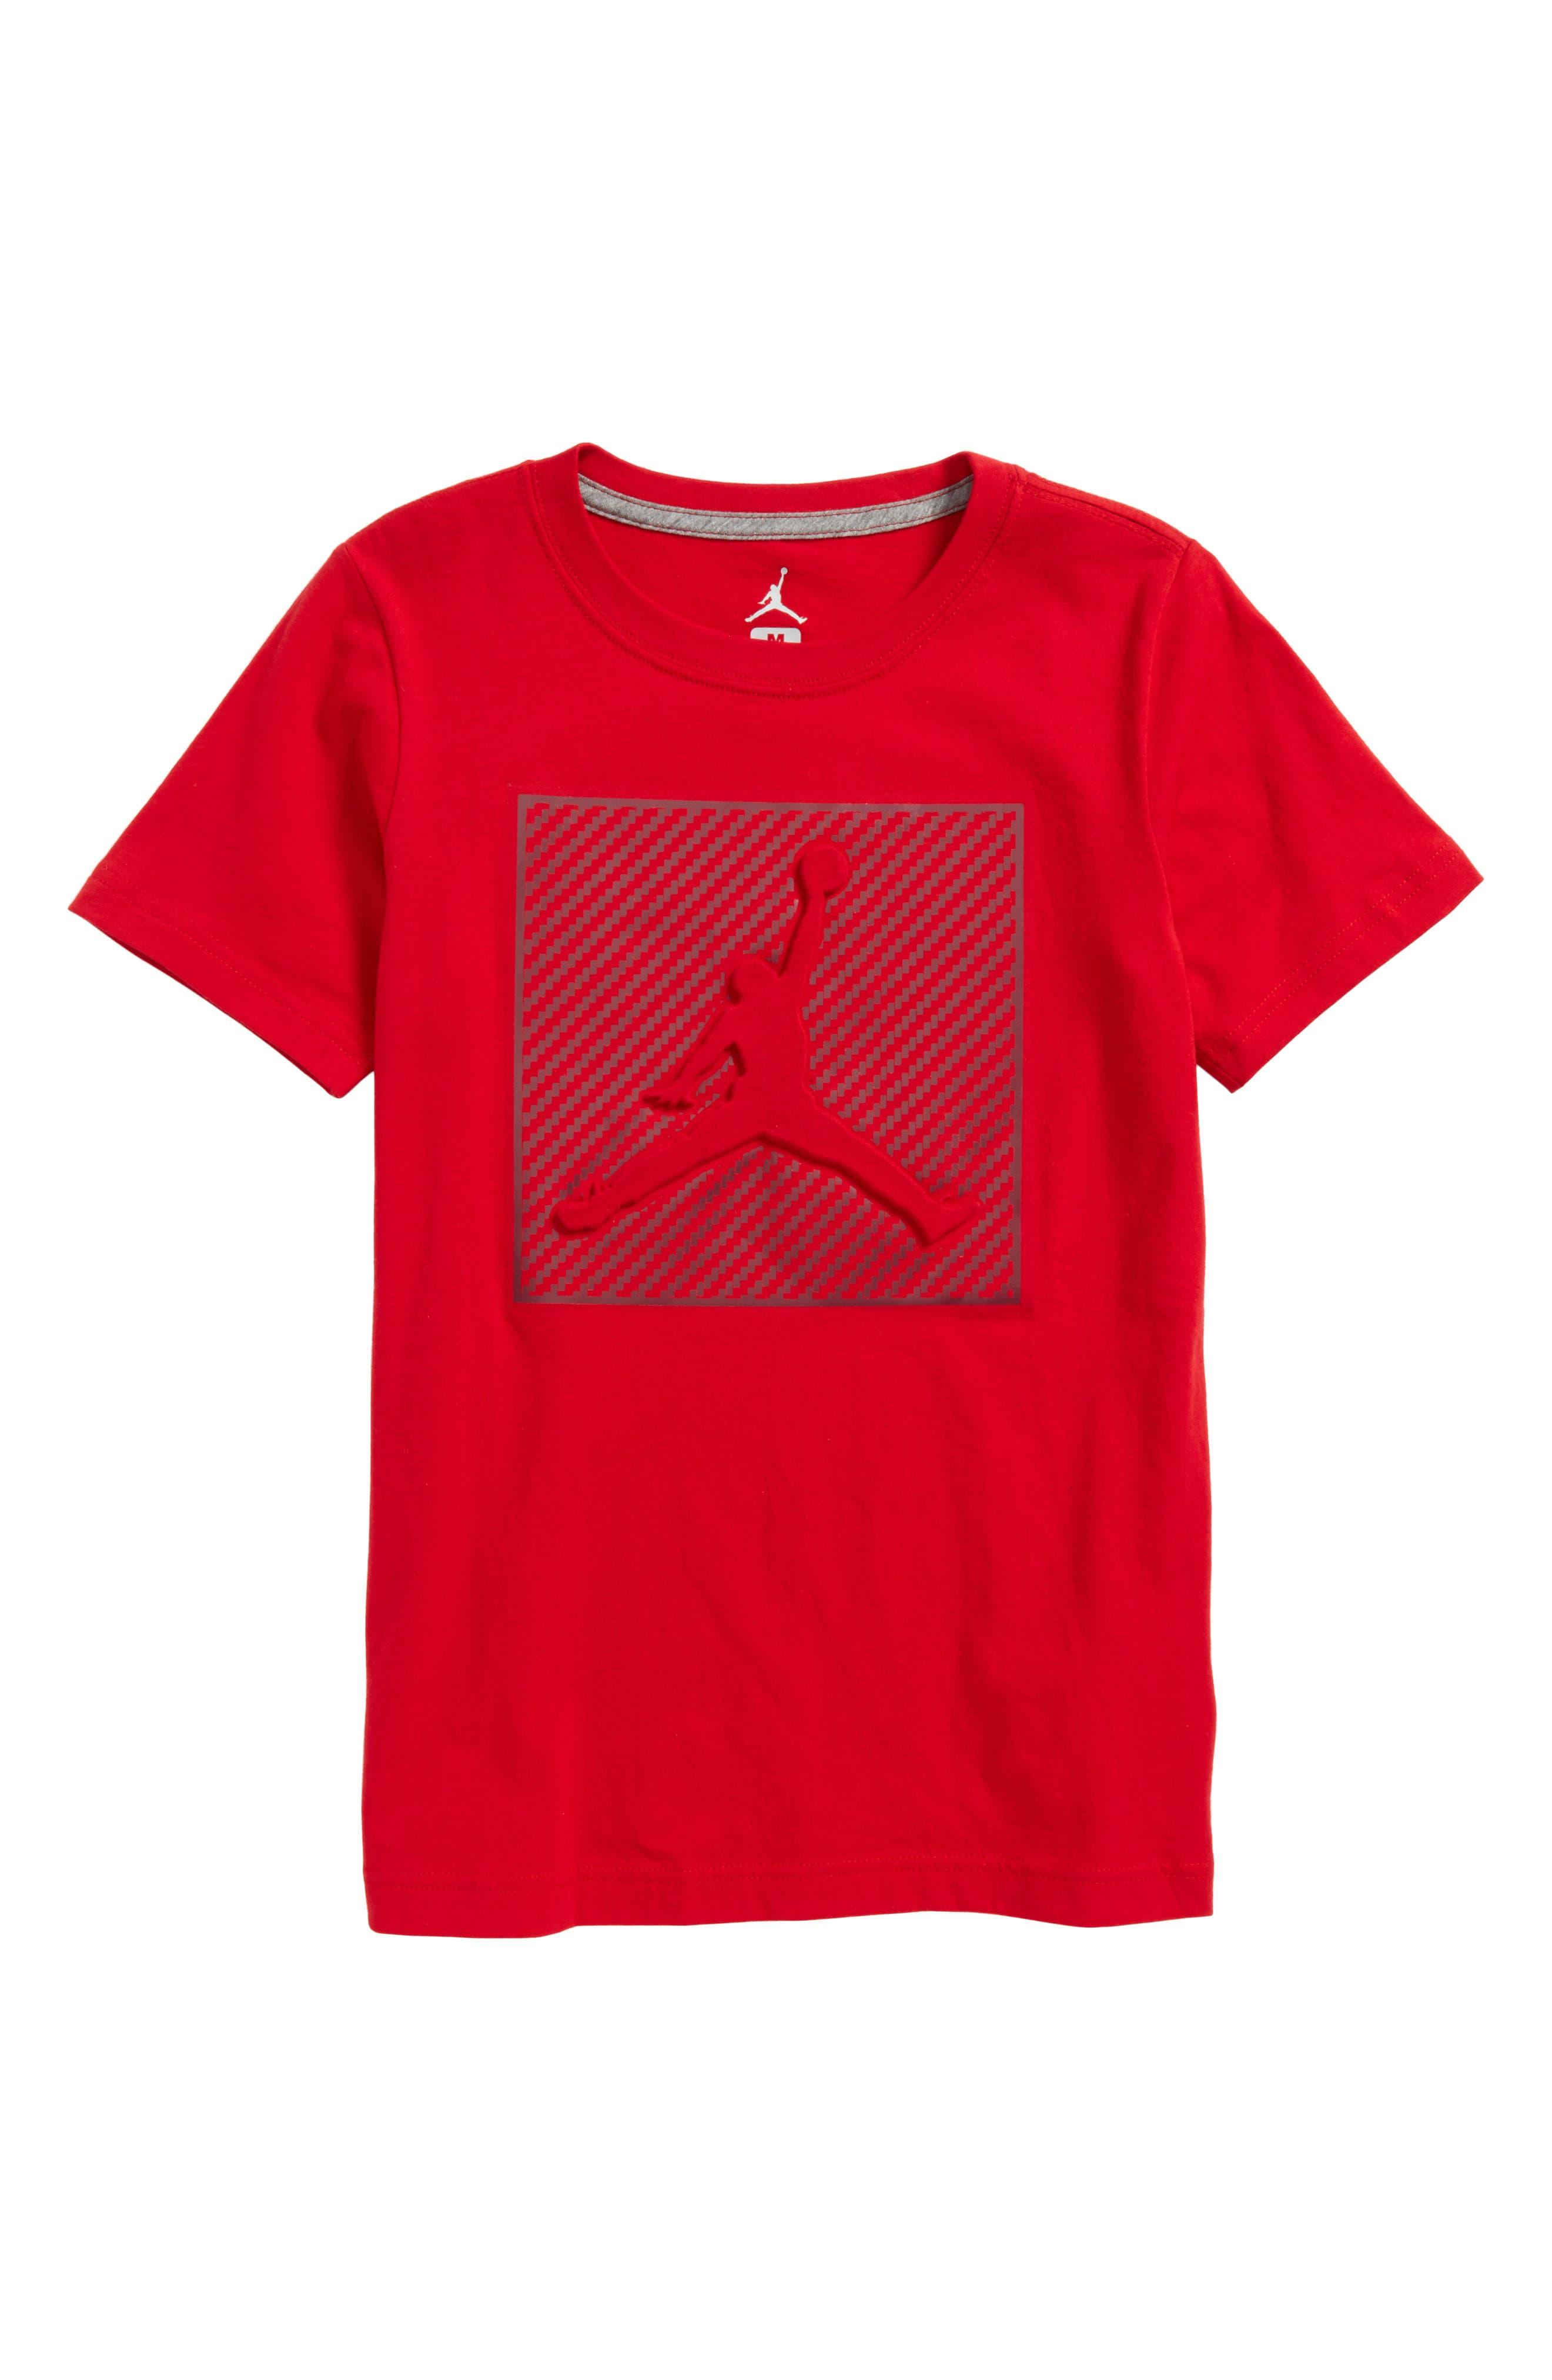 Jordan AJ Emboss Carbon T-Shirt,                             Main thumbnail 1, color,                             Gym Red